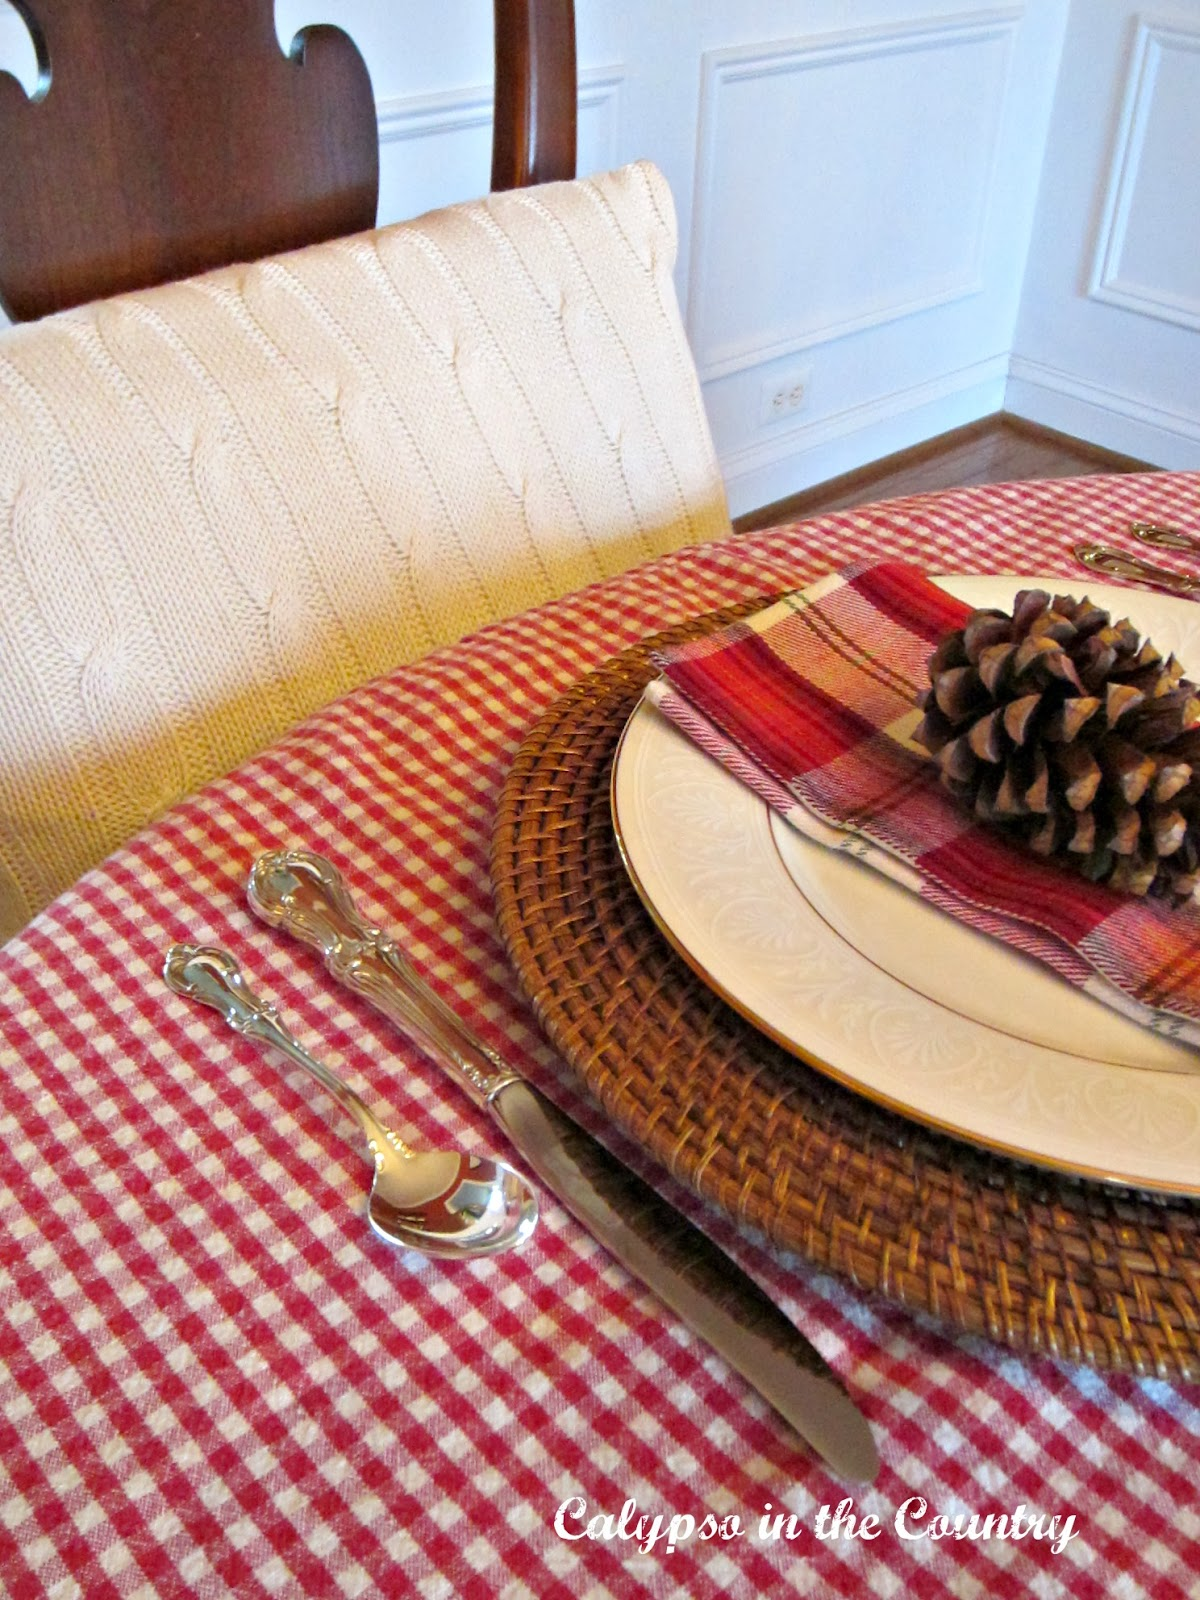 Christmas Place Setting with Checks and Plaid